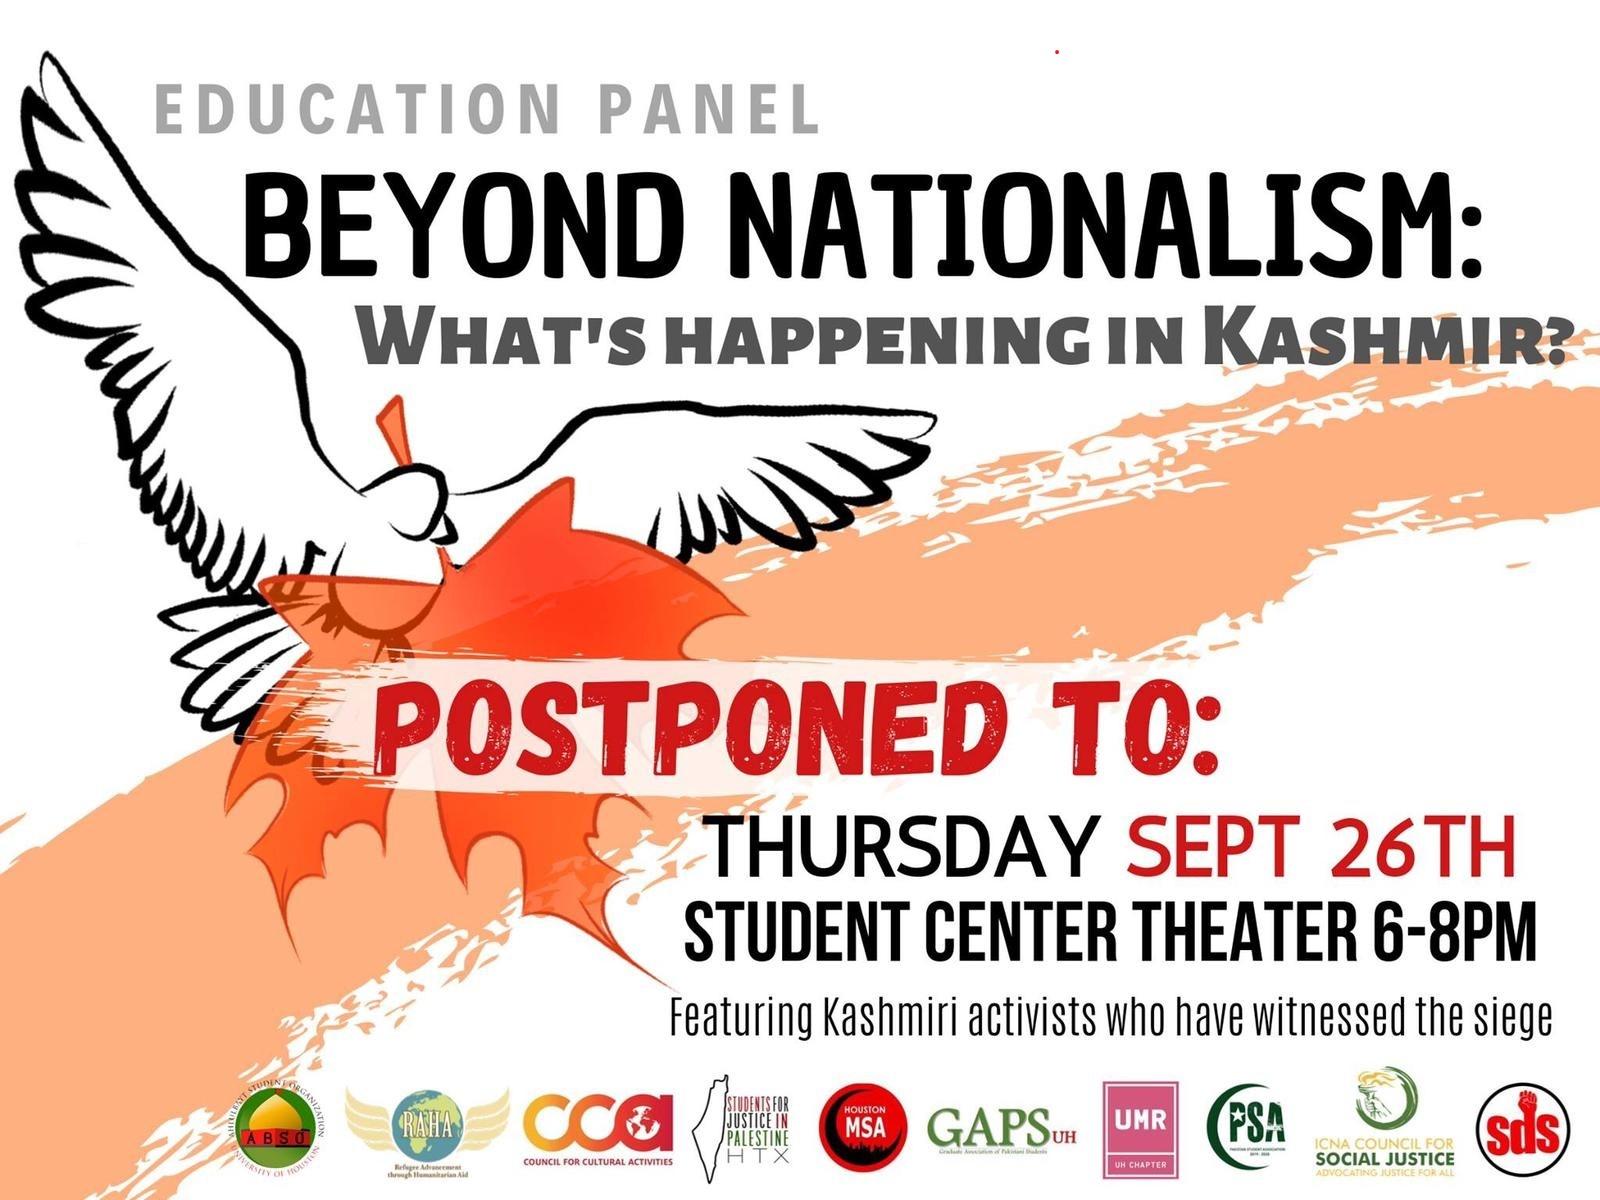 Anti-India and Anti-Israel Propaganda at The University of Houston